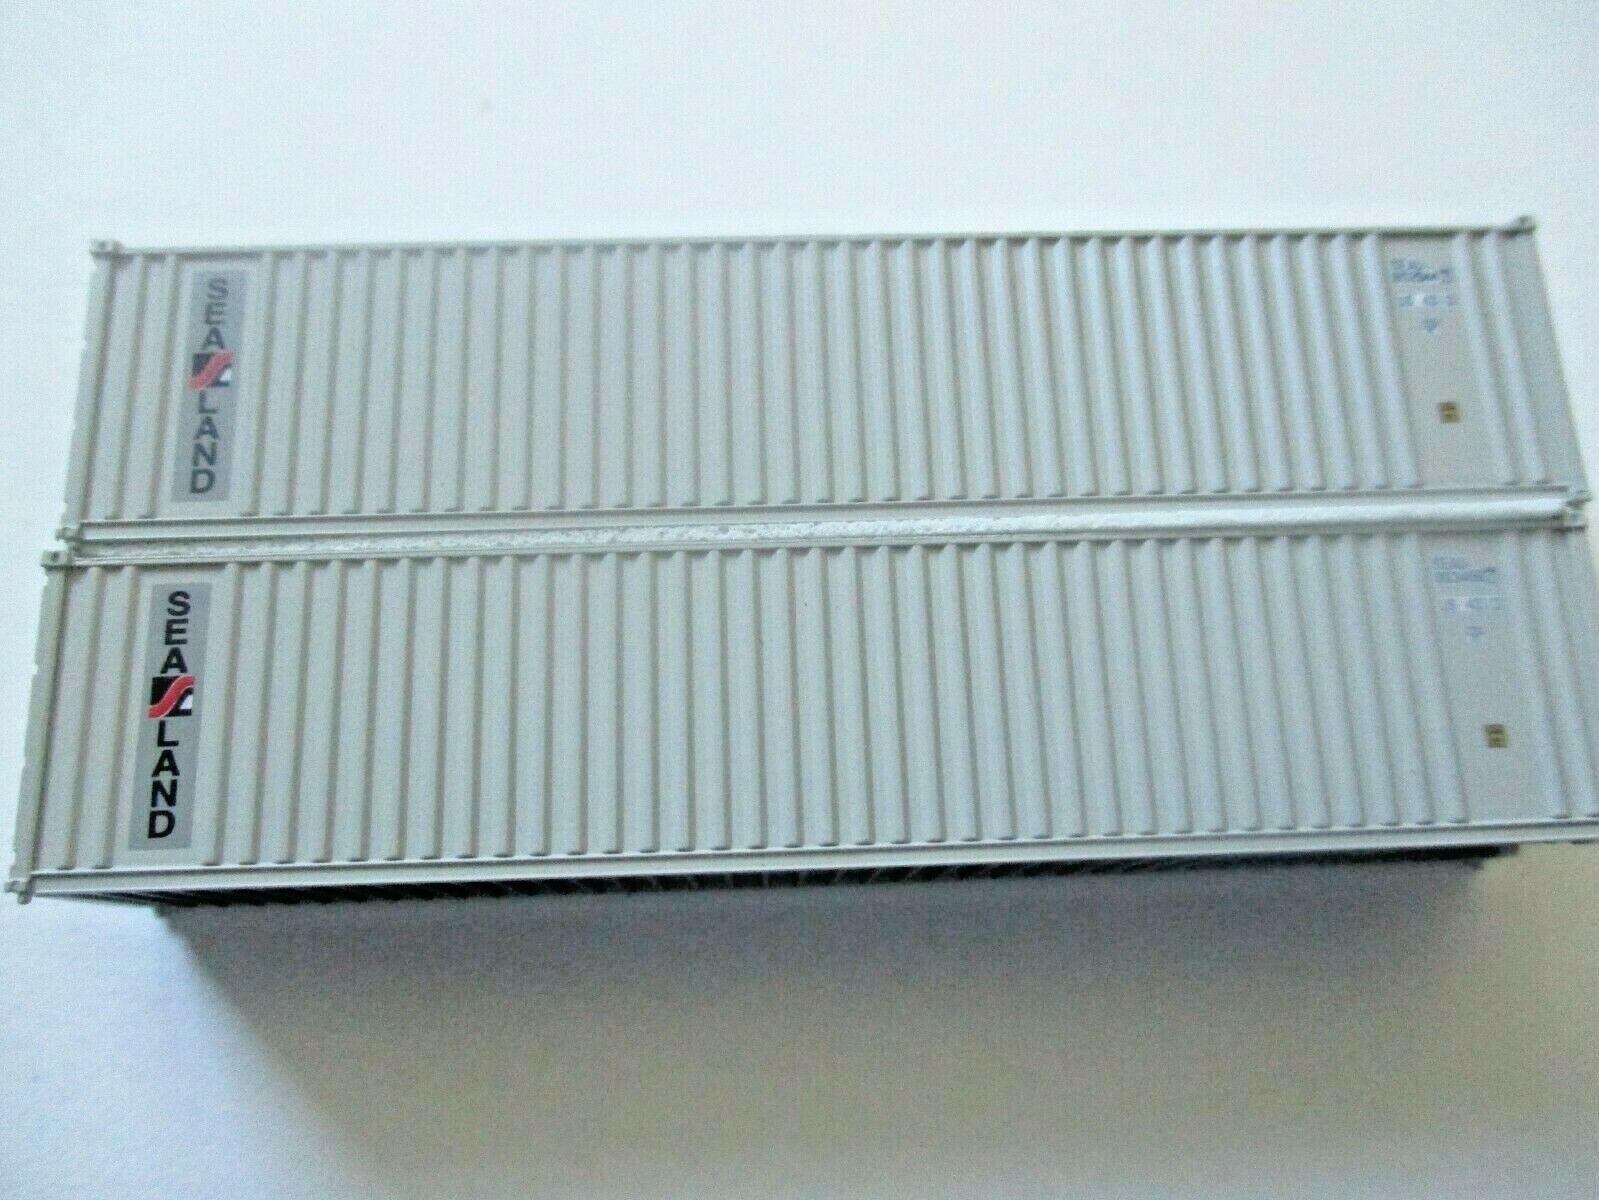 Jacksonville Terminal Company # 405501 Sealand 40' Standard Wave Panel Side (N)